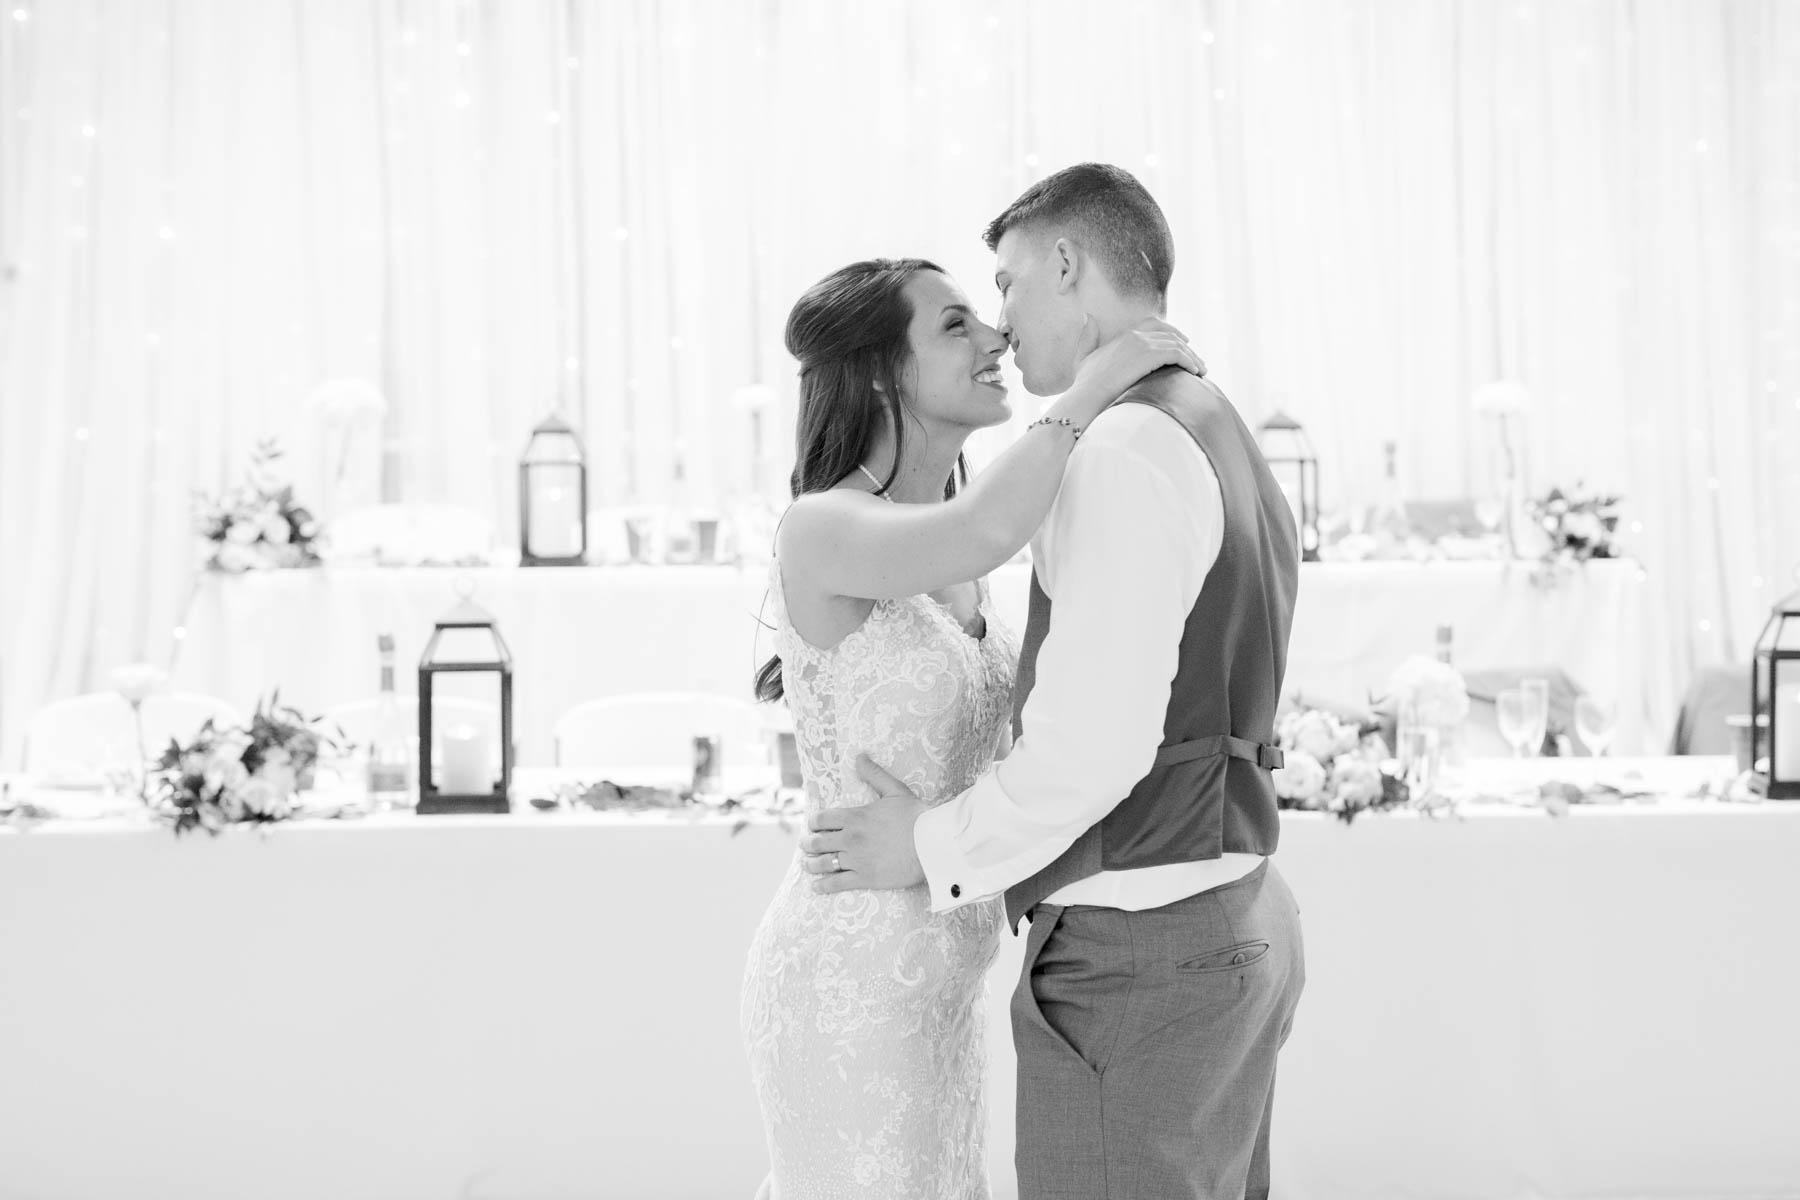 shotbychelsea_wedding_blog-35.jpg